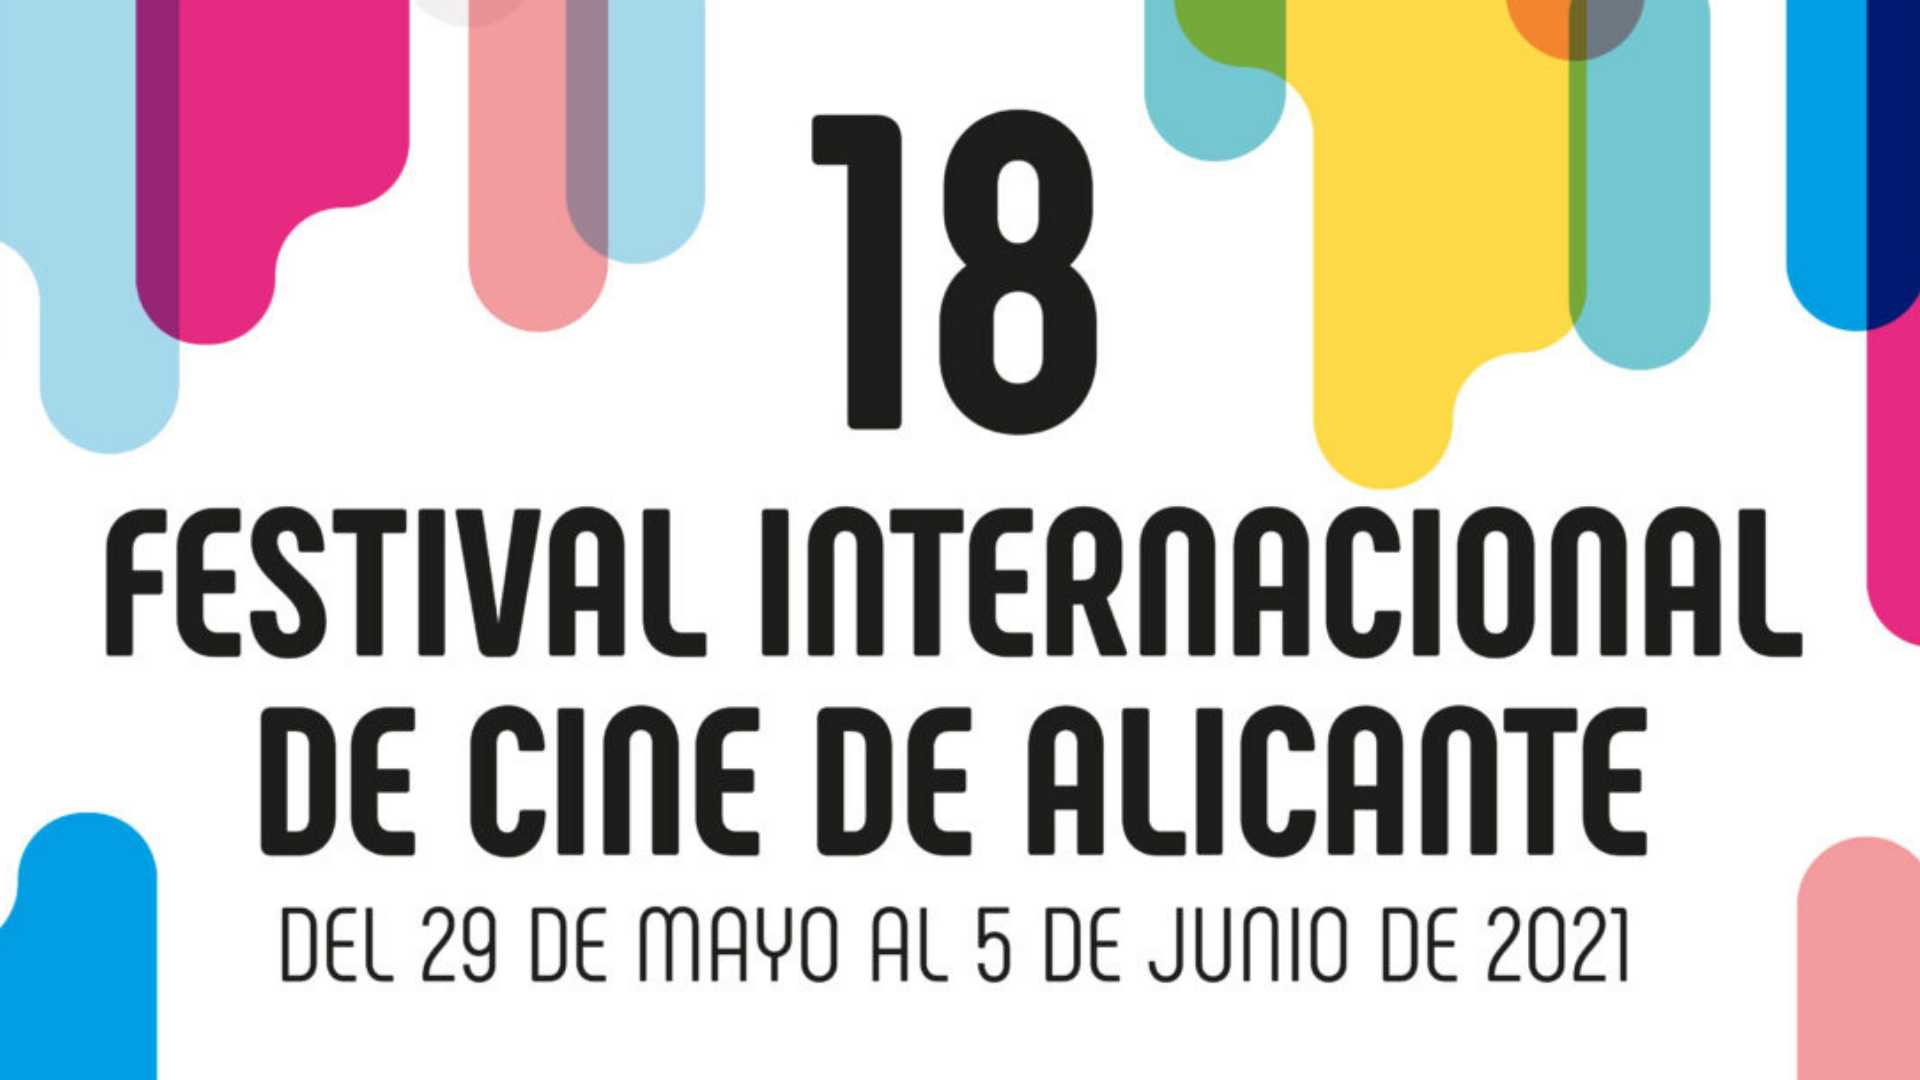 XVIII Festival Internacional de Cine de Alicante